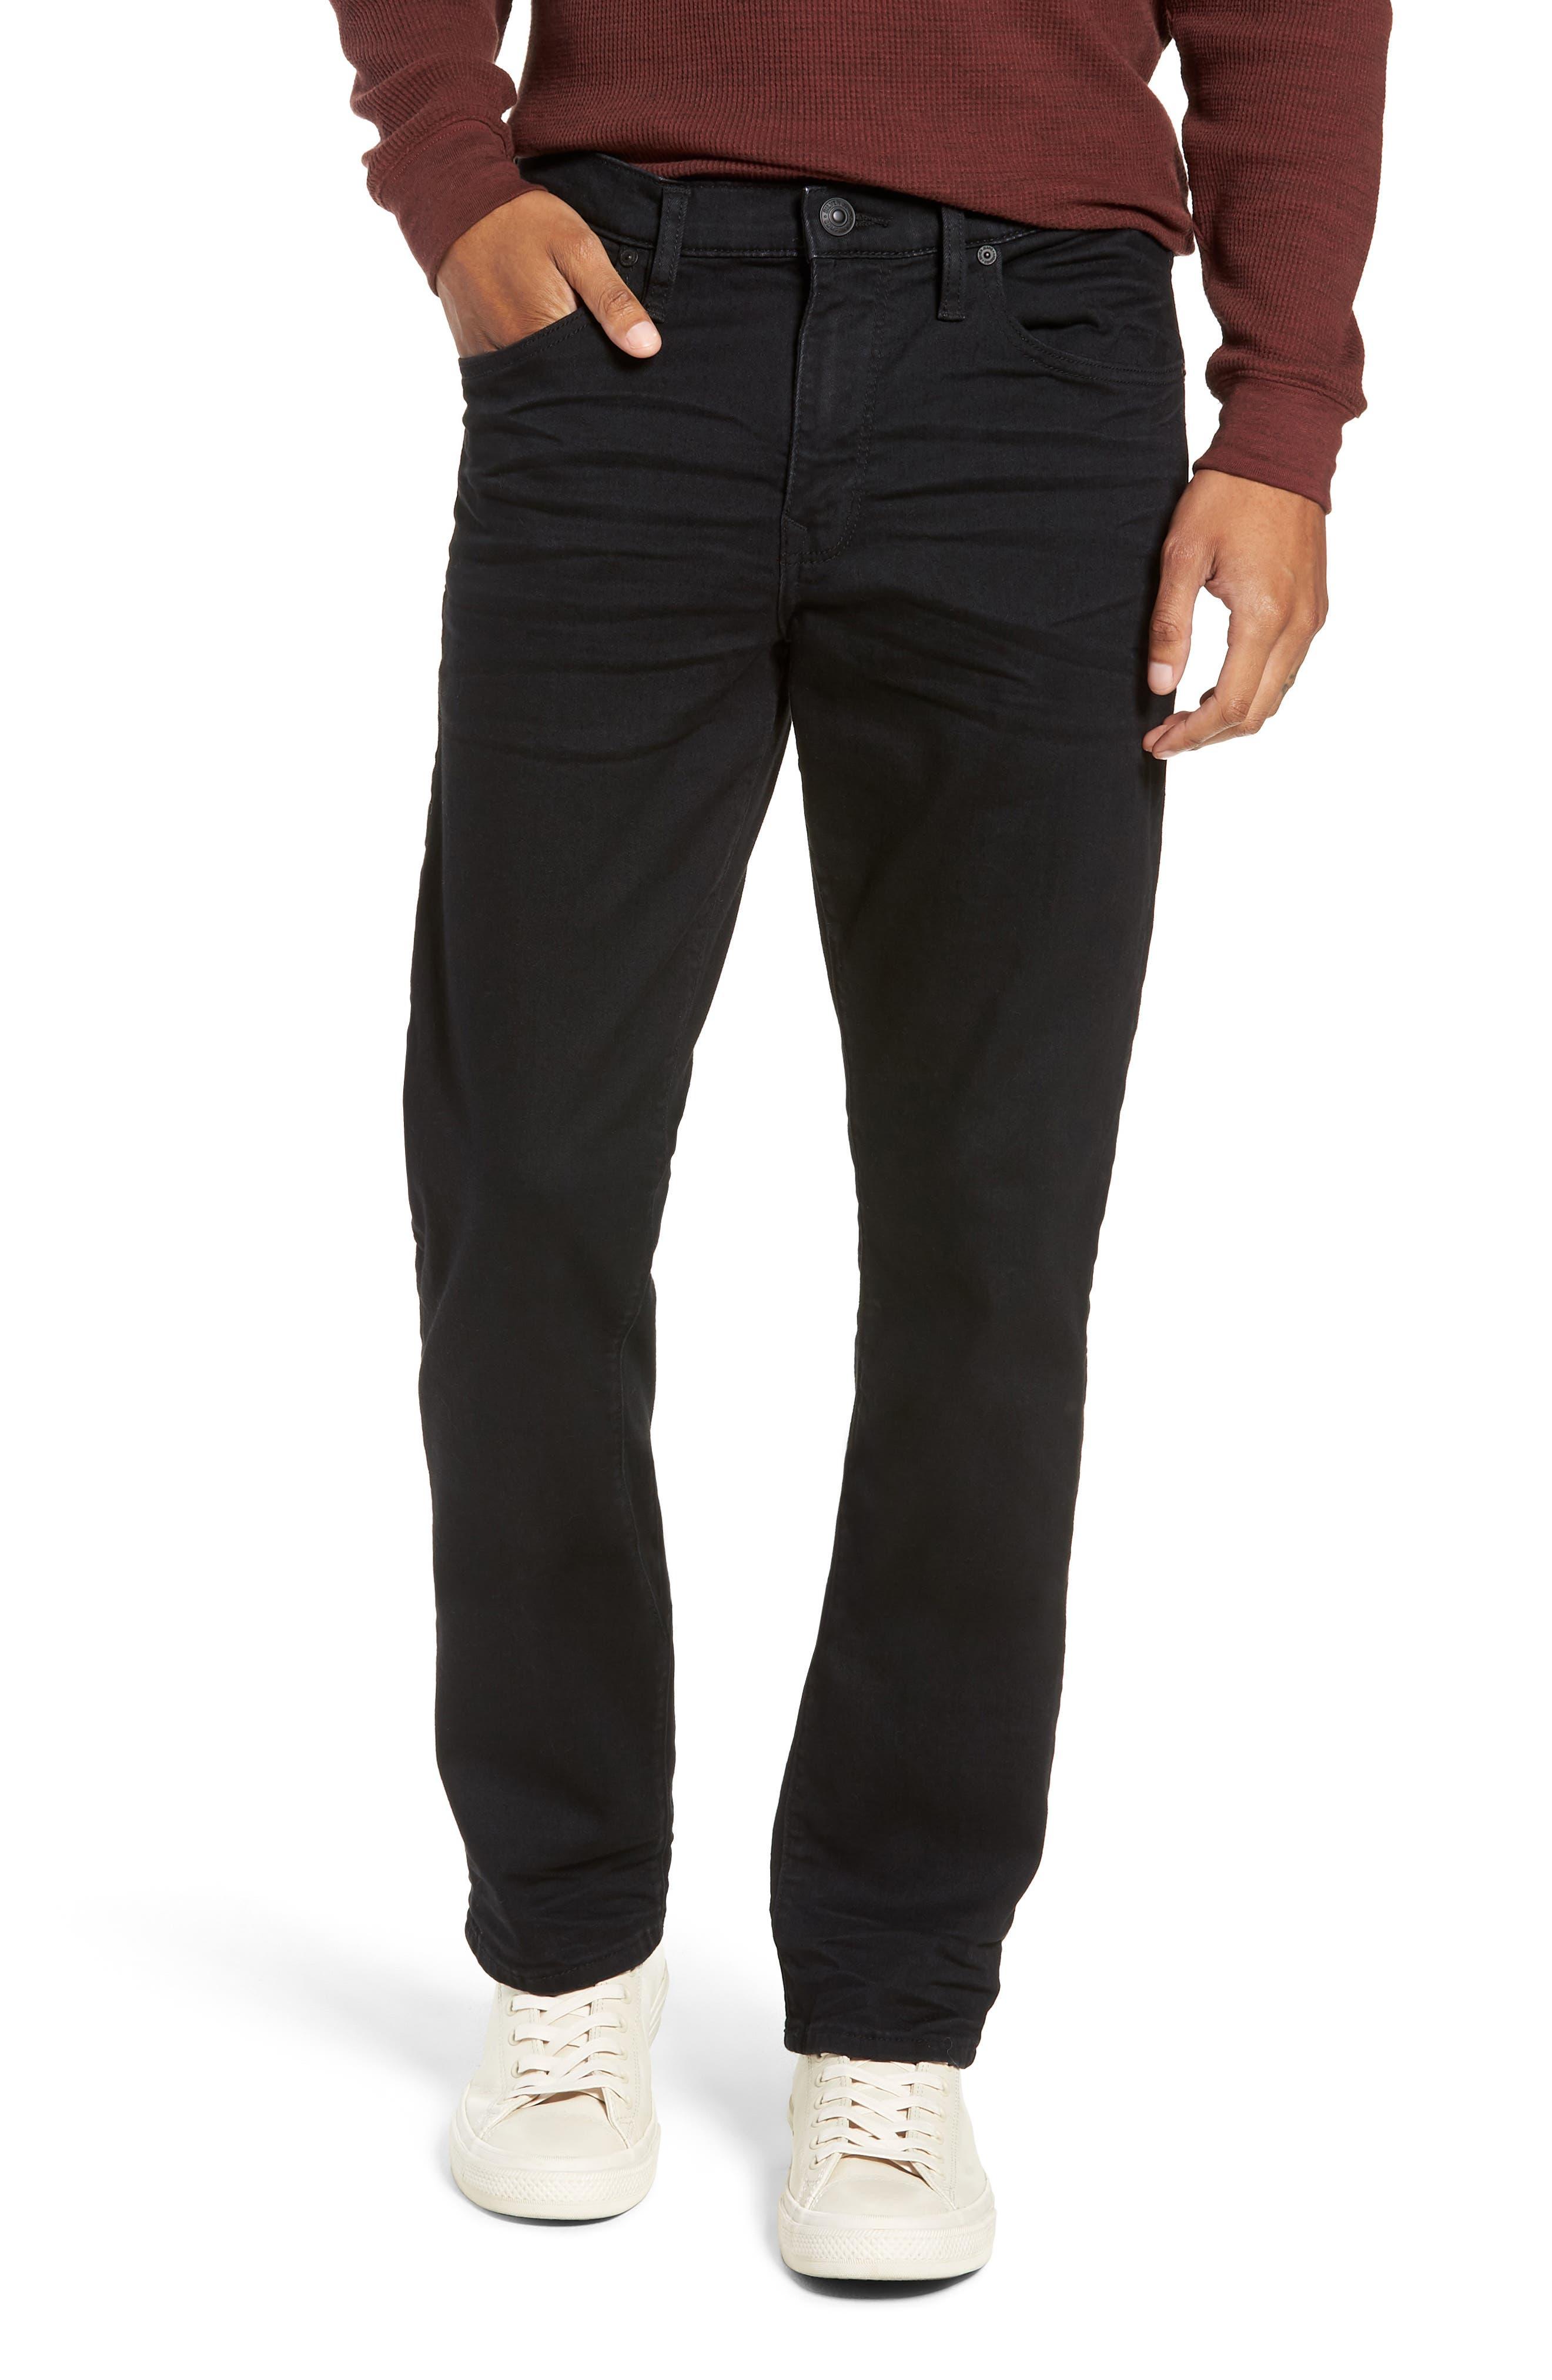 Men's Silver Jeans Co. Kenaston Slim Fit Jeans